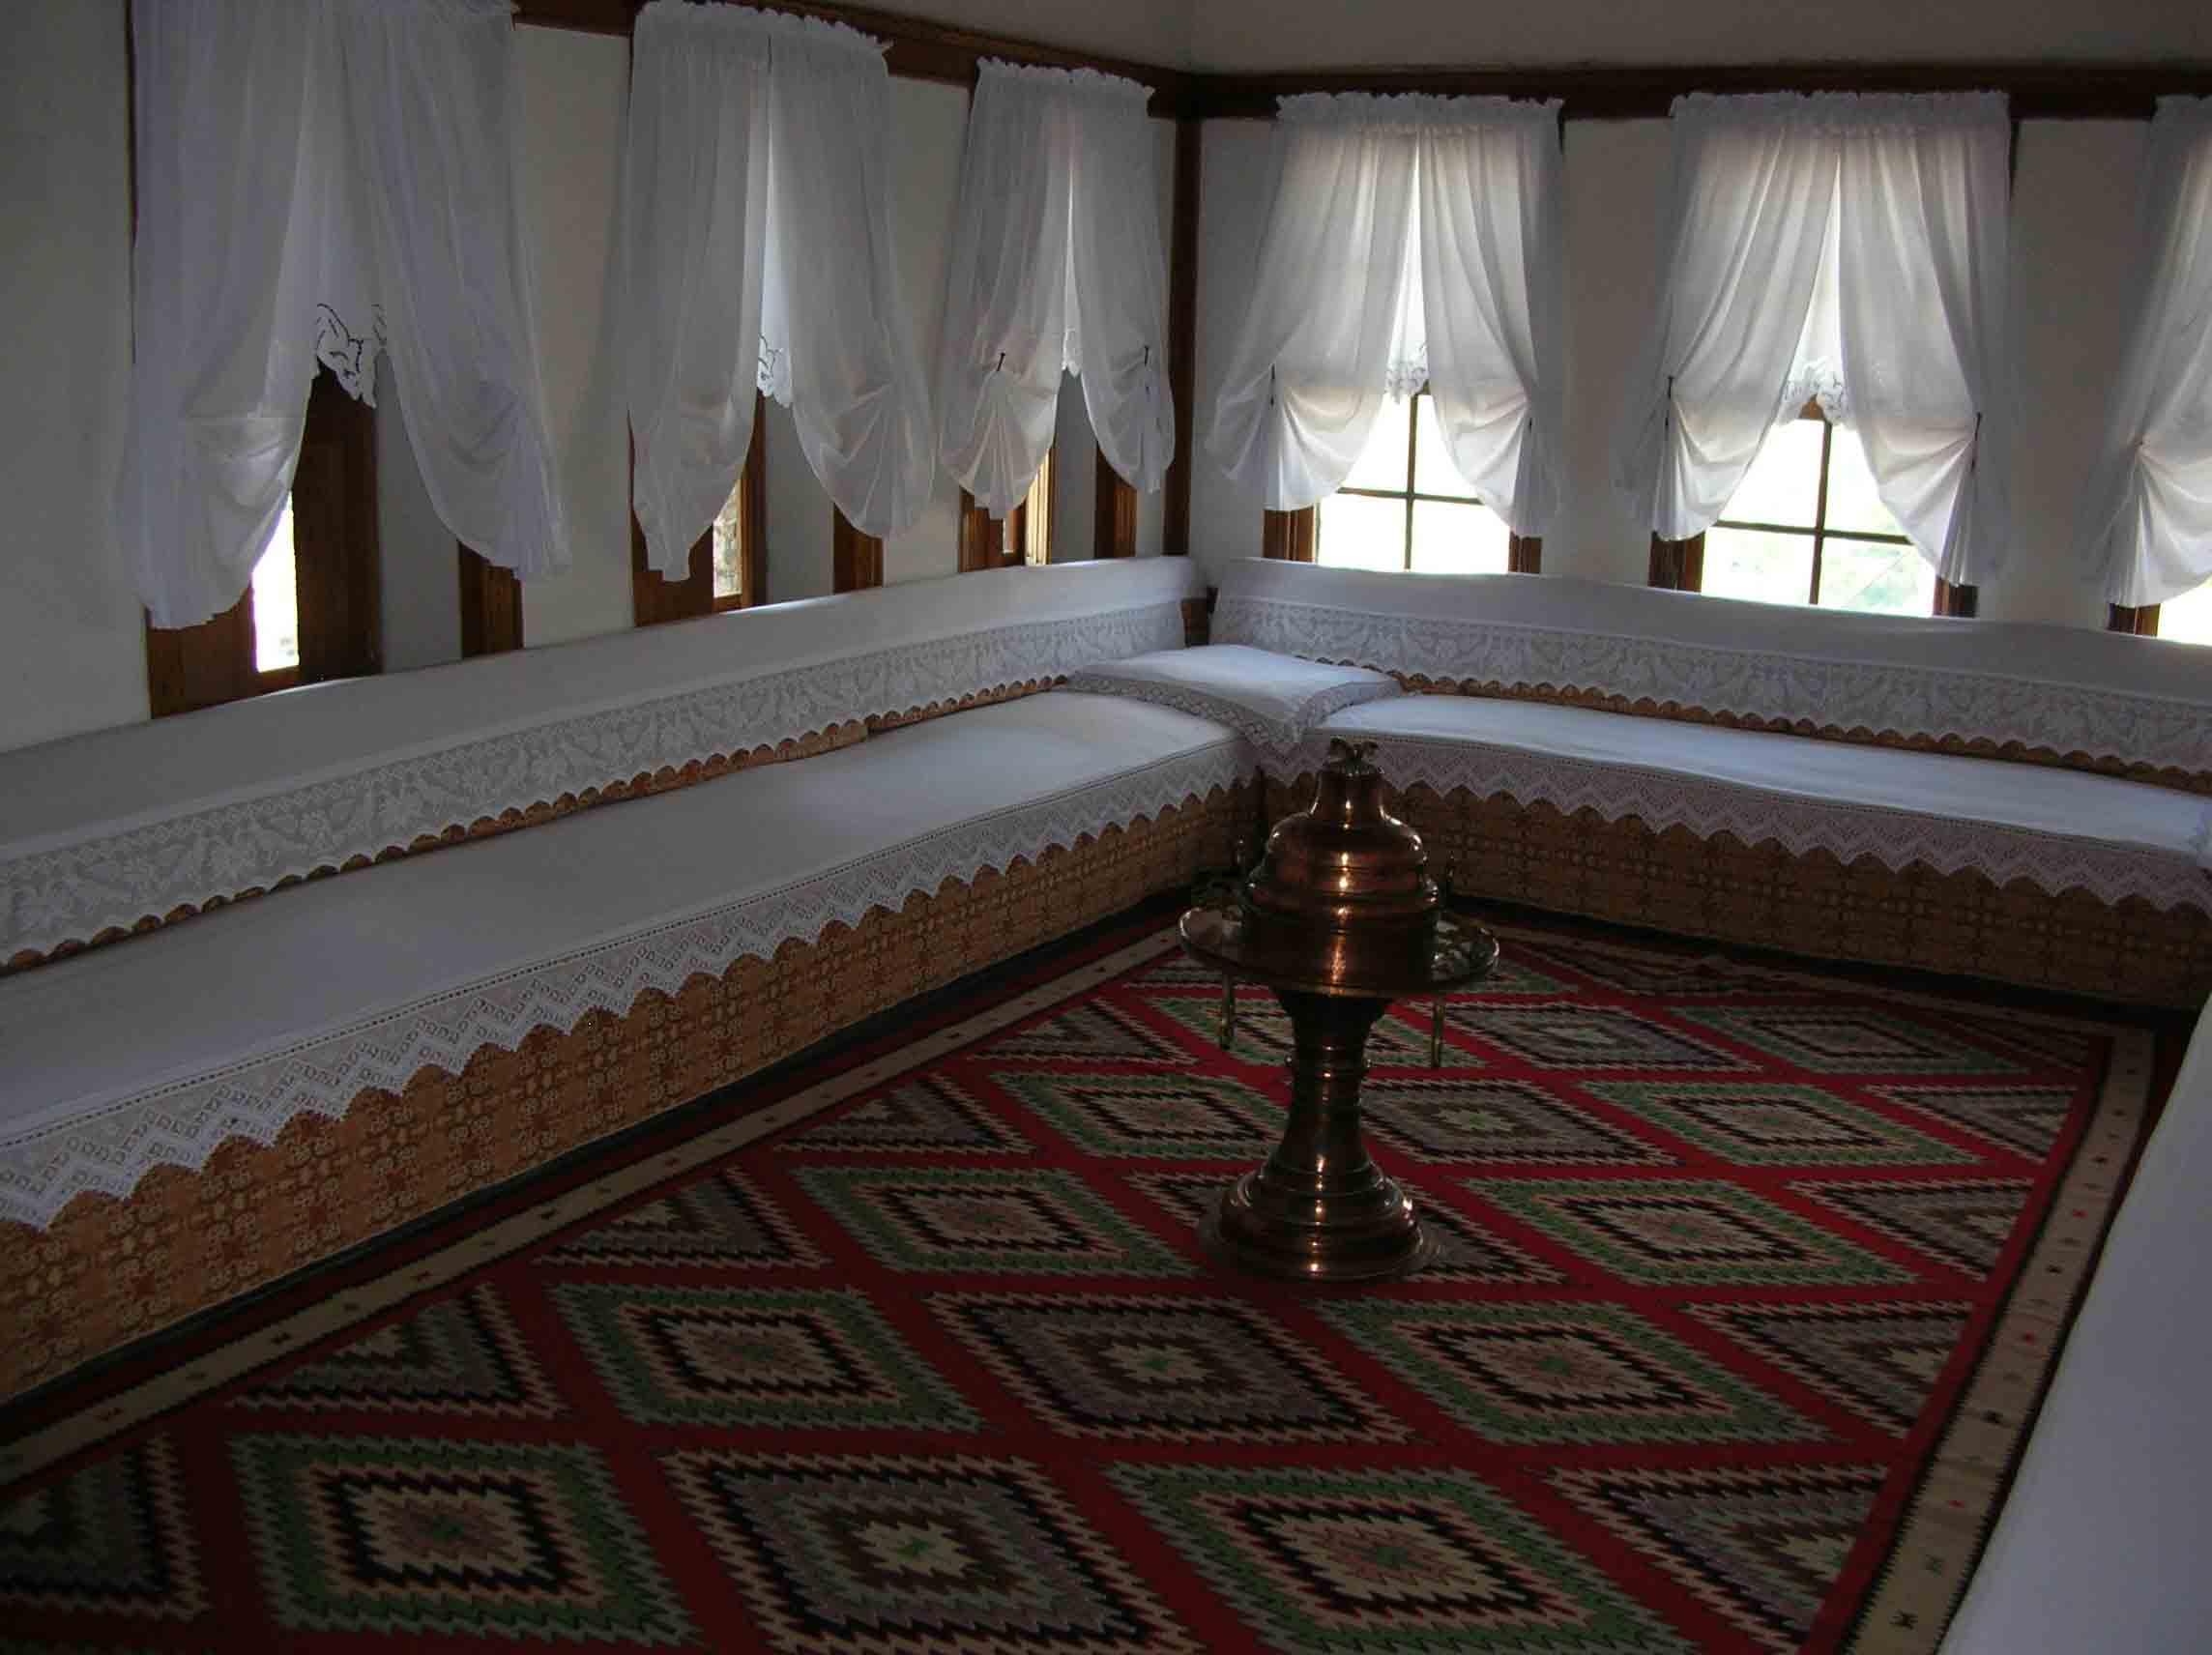 blick ins innere eines altstadthauses in gjirokastra